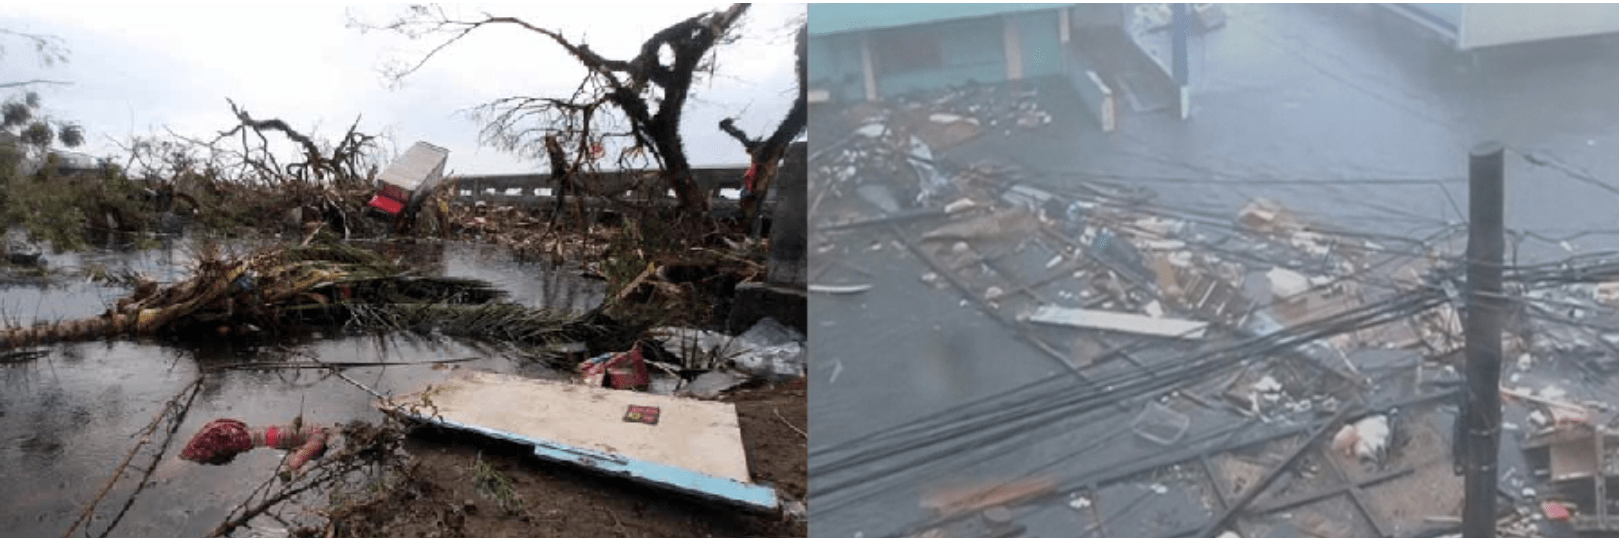 destruction of tacloban Philippines from Typhoon Yolanda